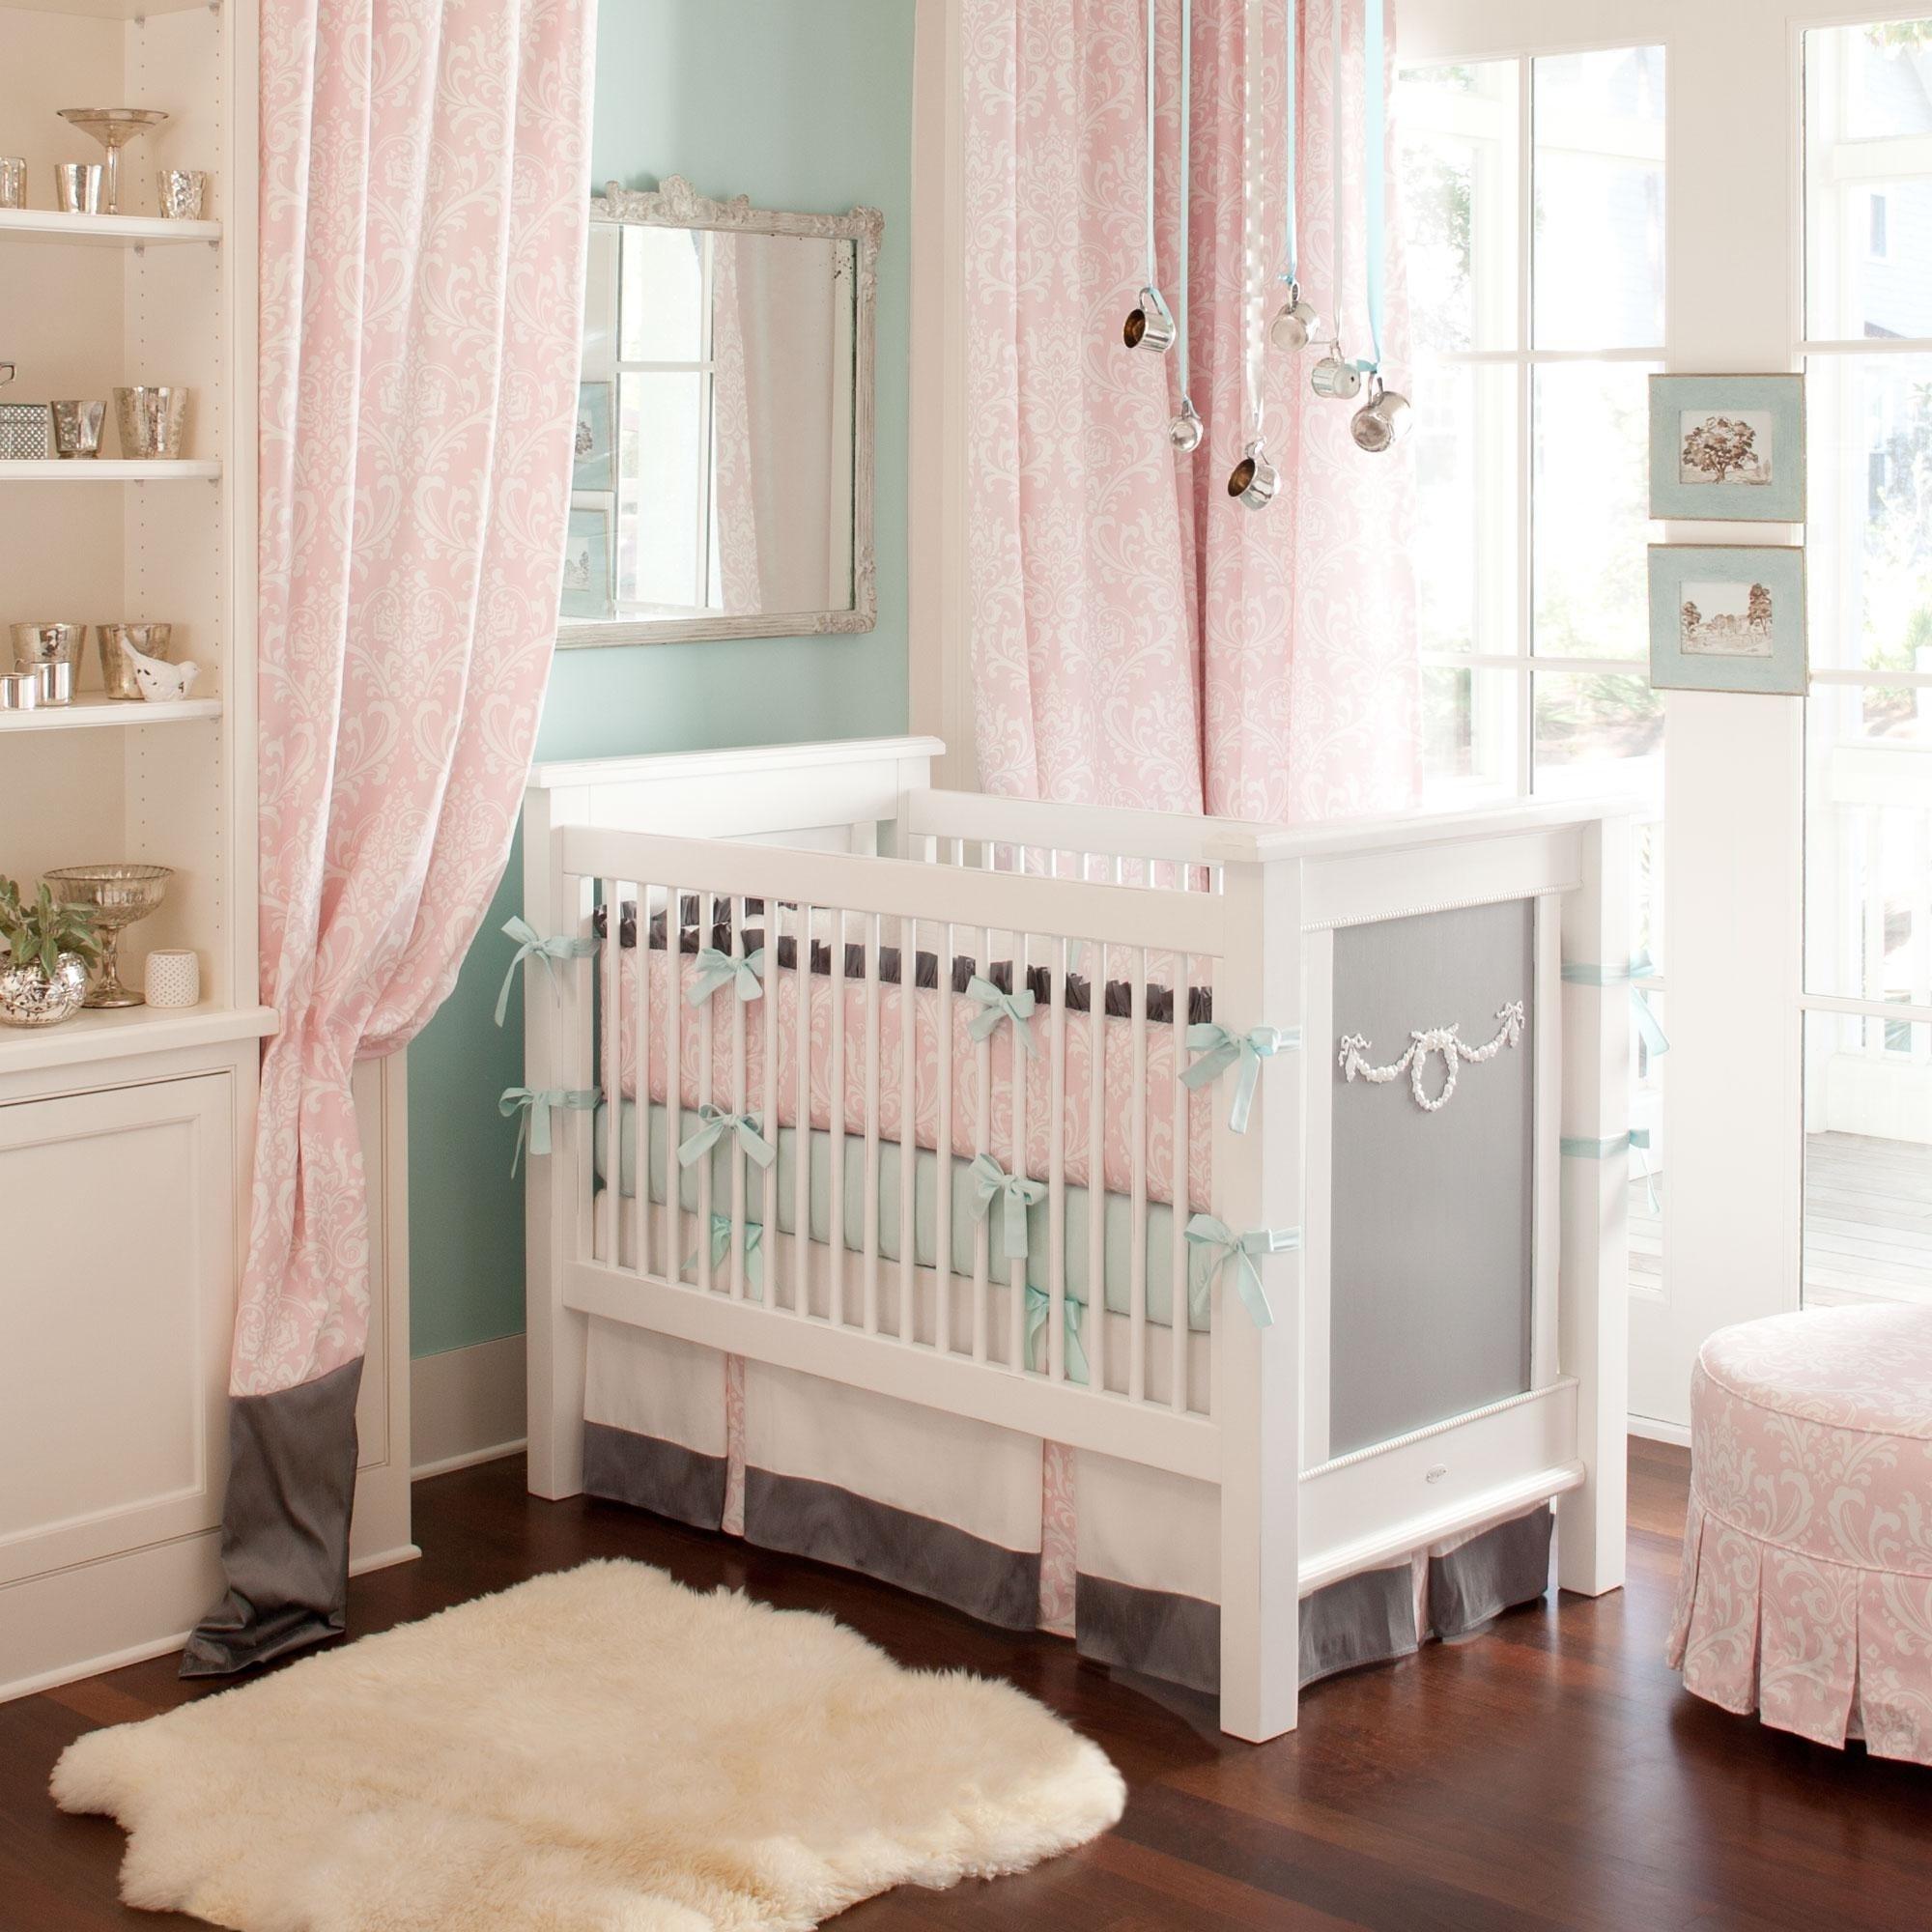 10 Trendy Nursery Ideas On A Budget baby nursery ideas decorating baby nursery on budget unisex ideas